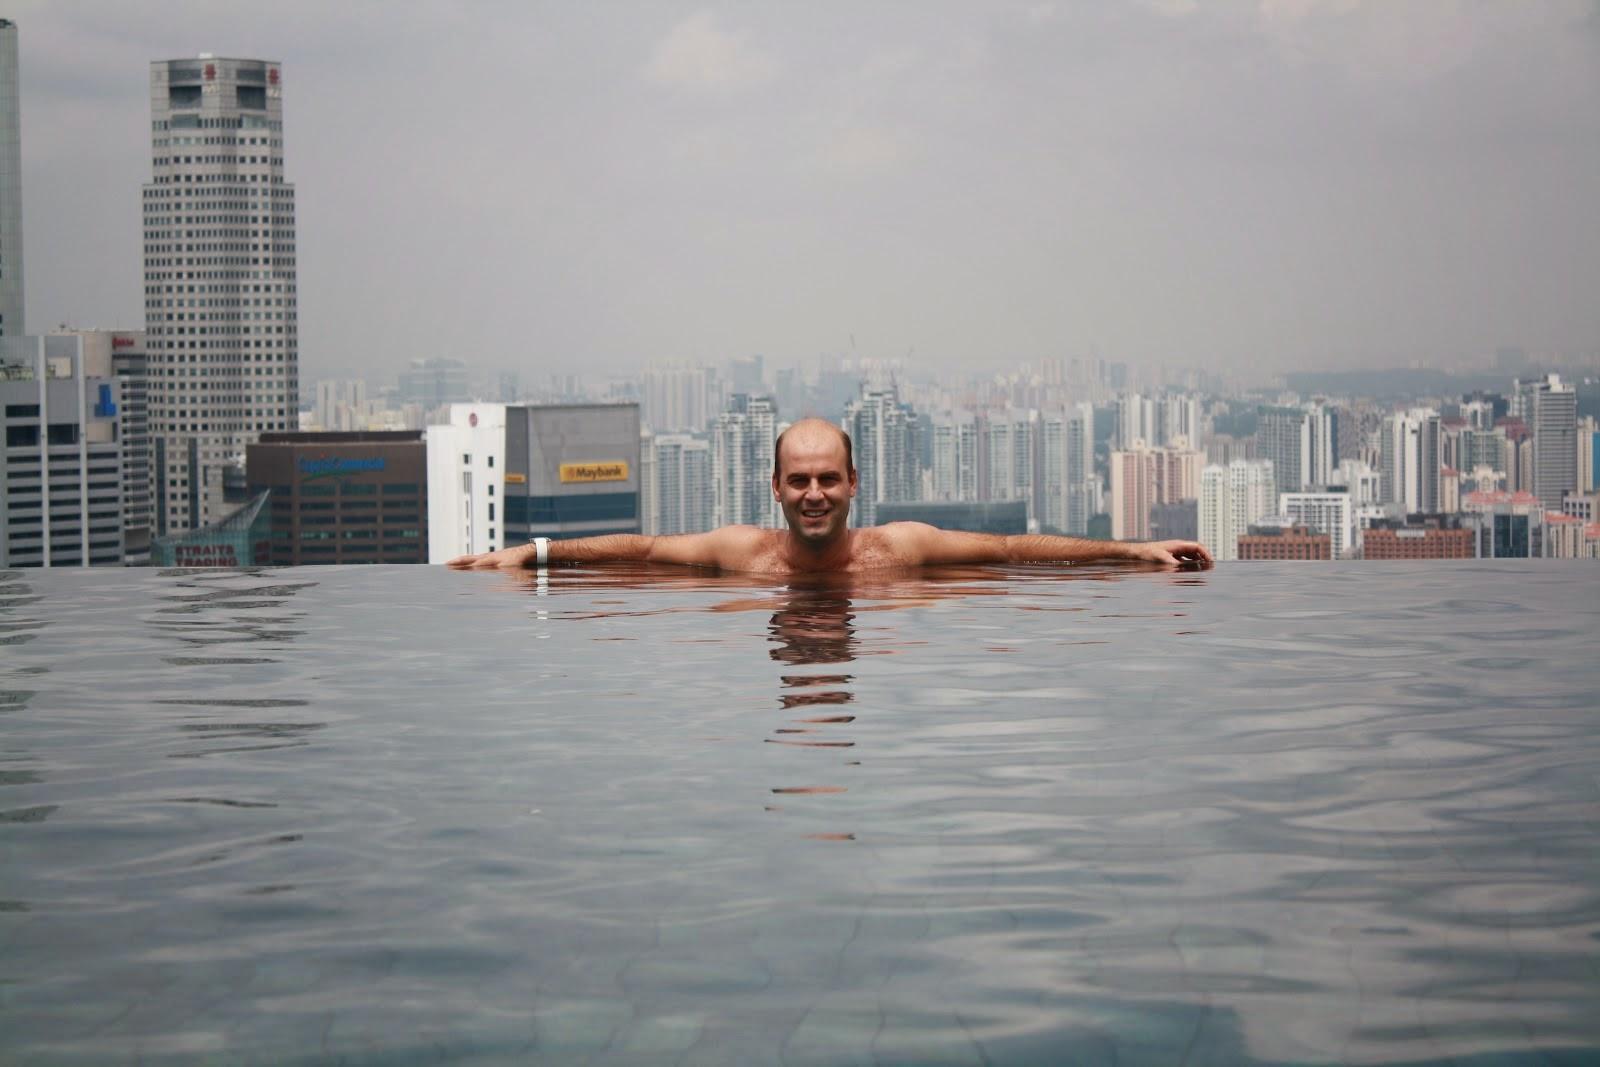 psicina del hotel marina bay sand en singapur